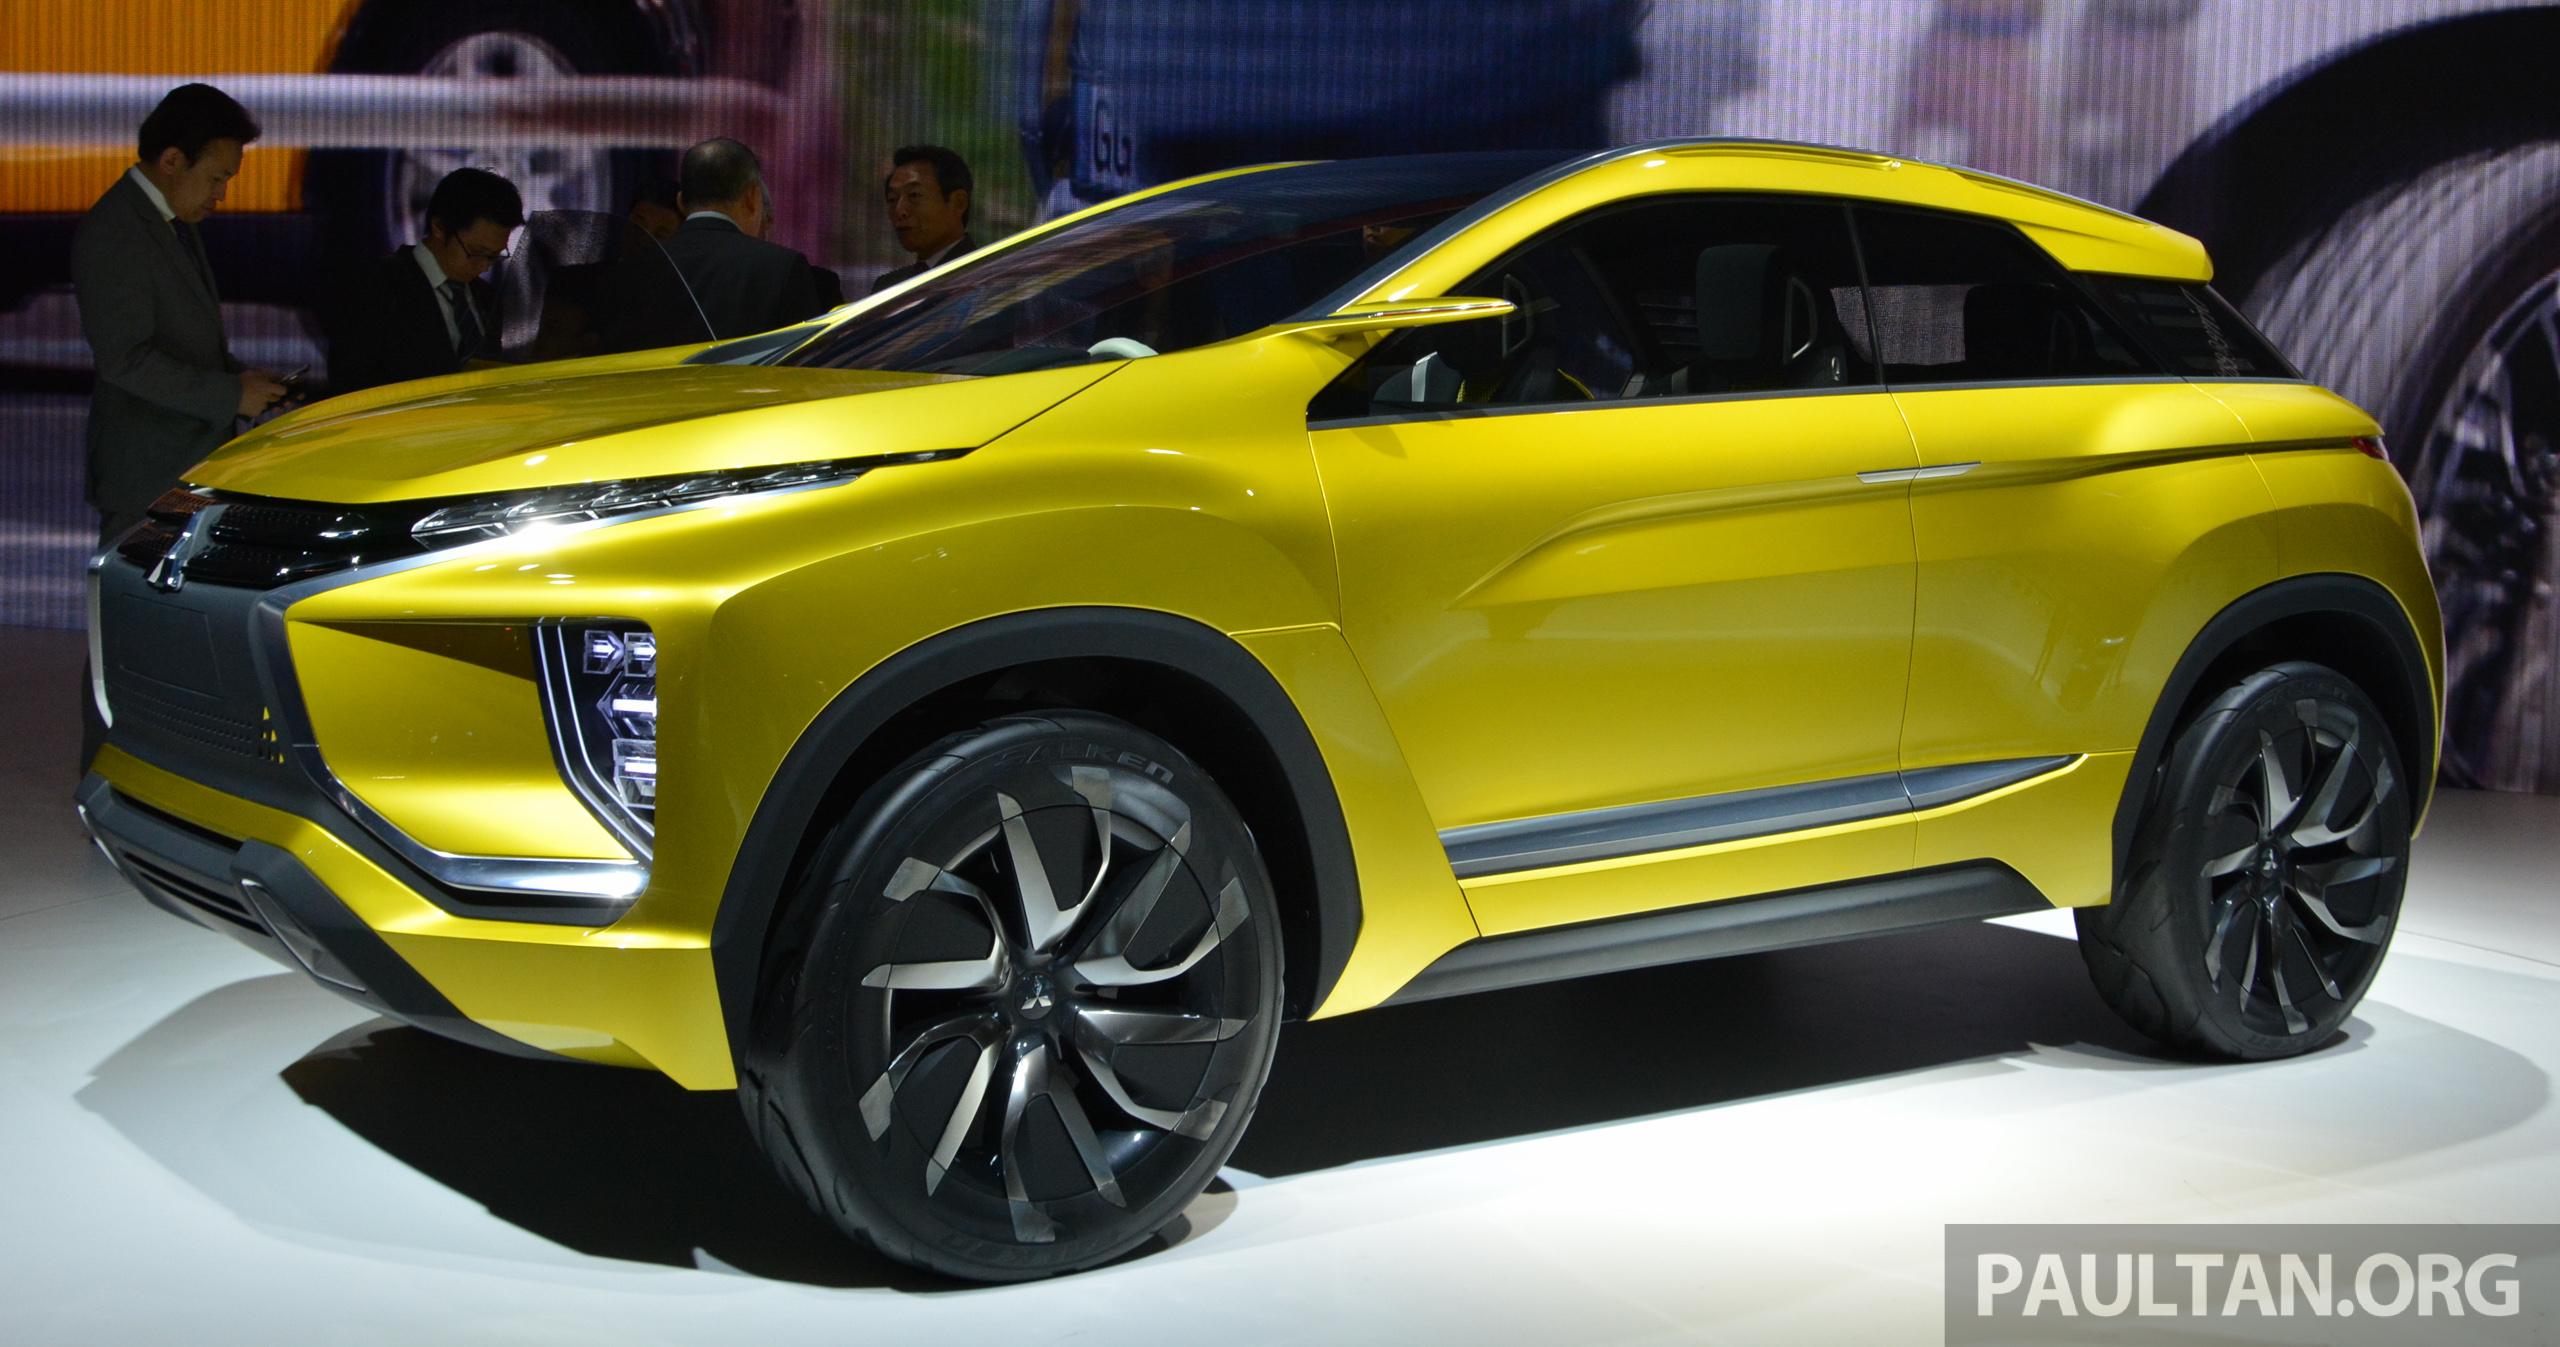 Mitsubishi Suv 2015 >> Tokyo 2015: Mitsubishi eX Concept makes world debut; all-electric SUV with 400 km cruising range ...